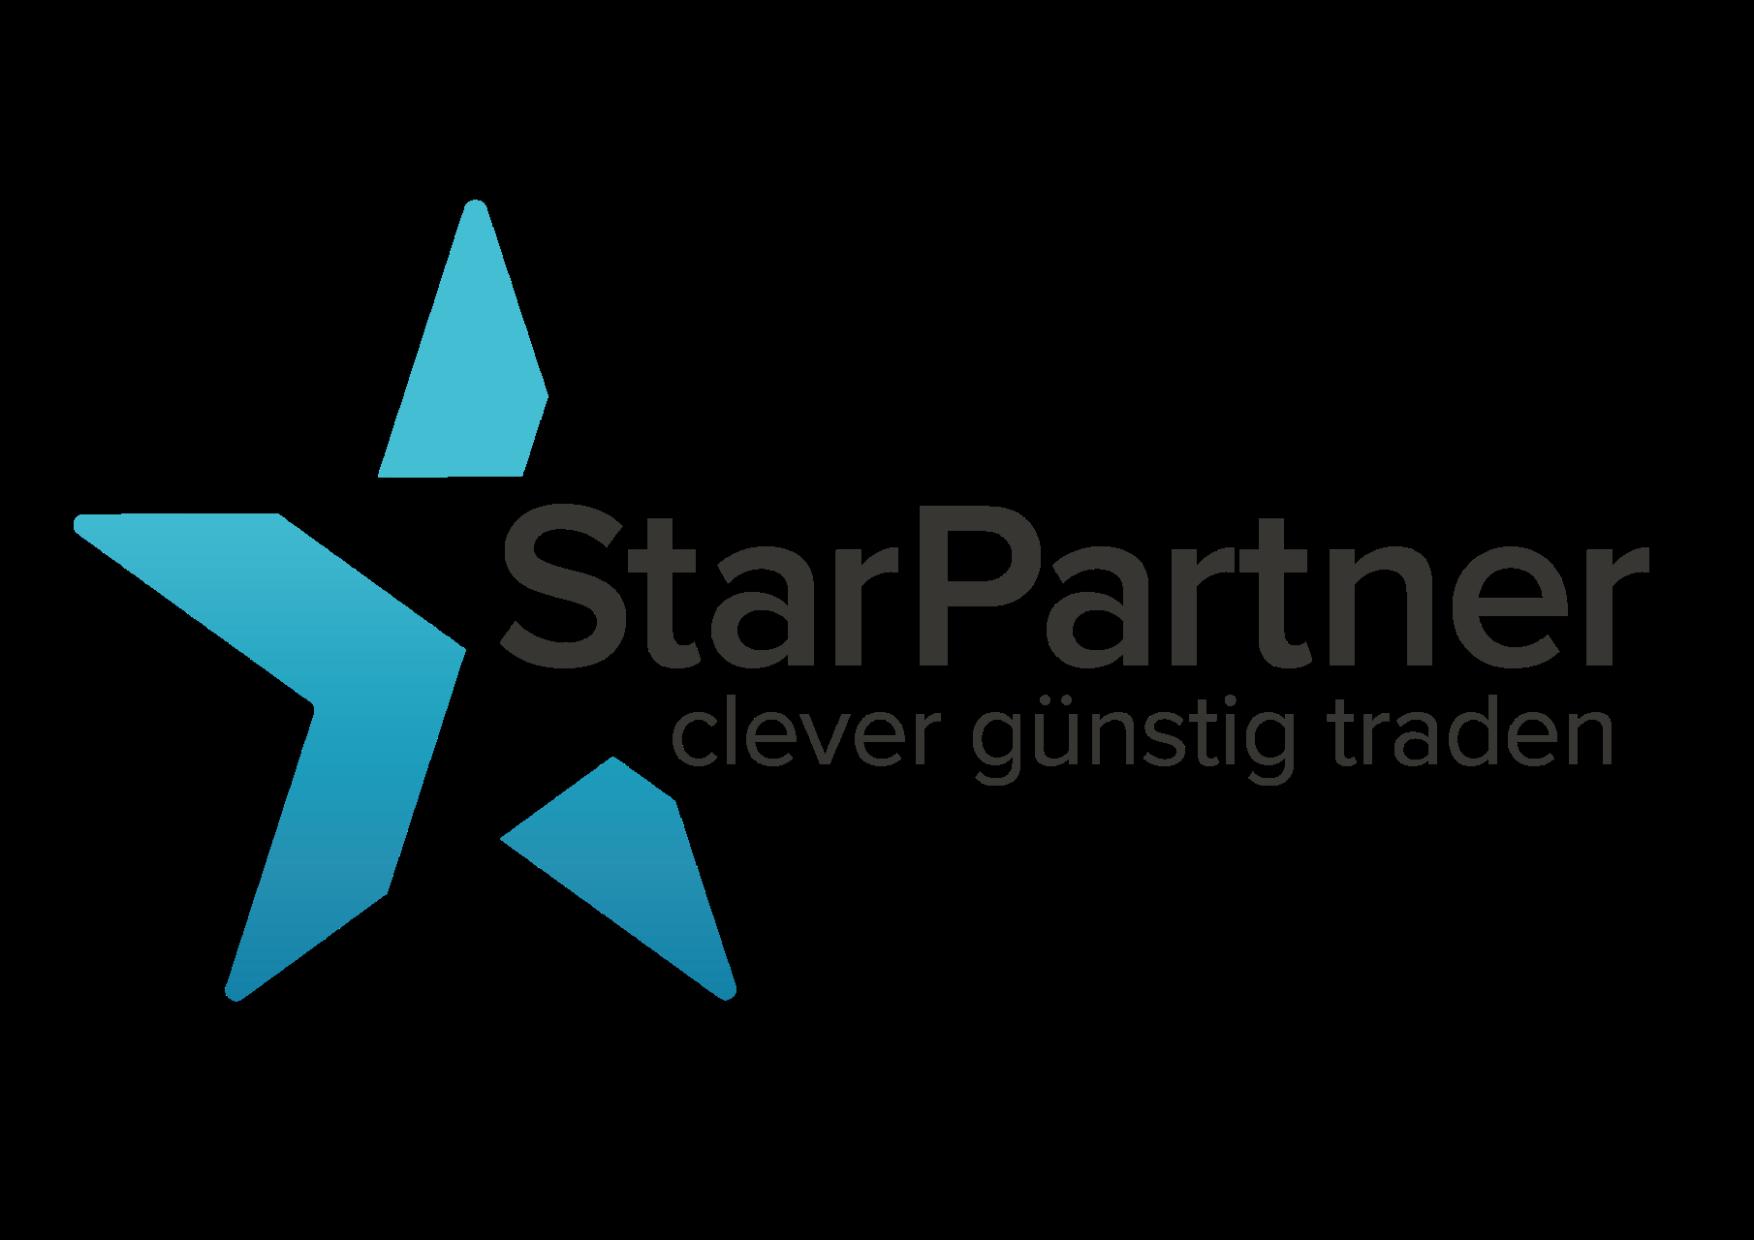 Consorsbank Starpartner